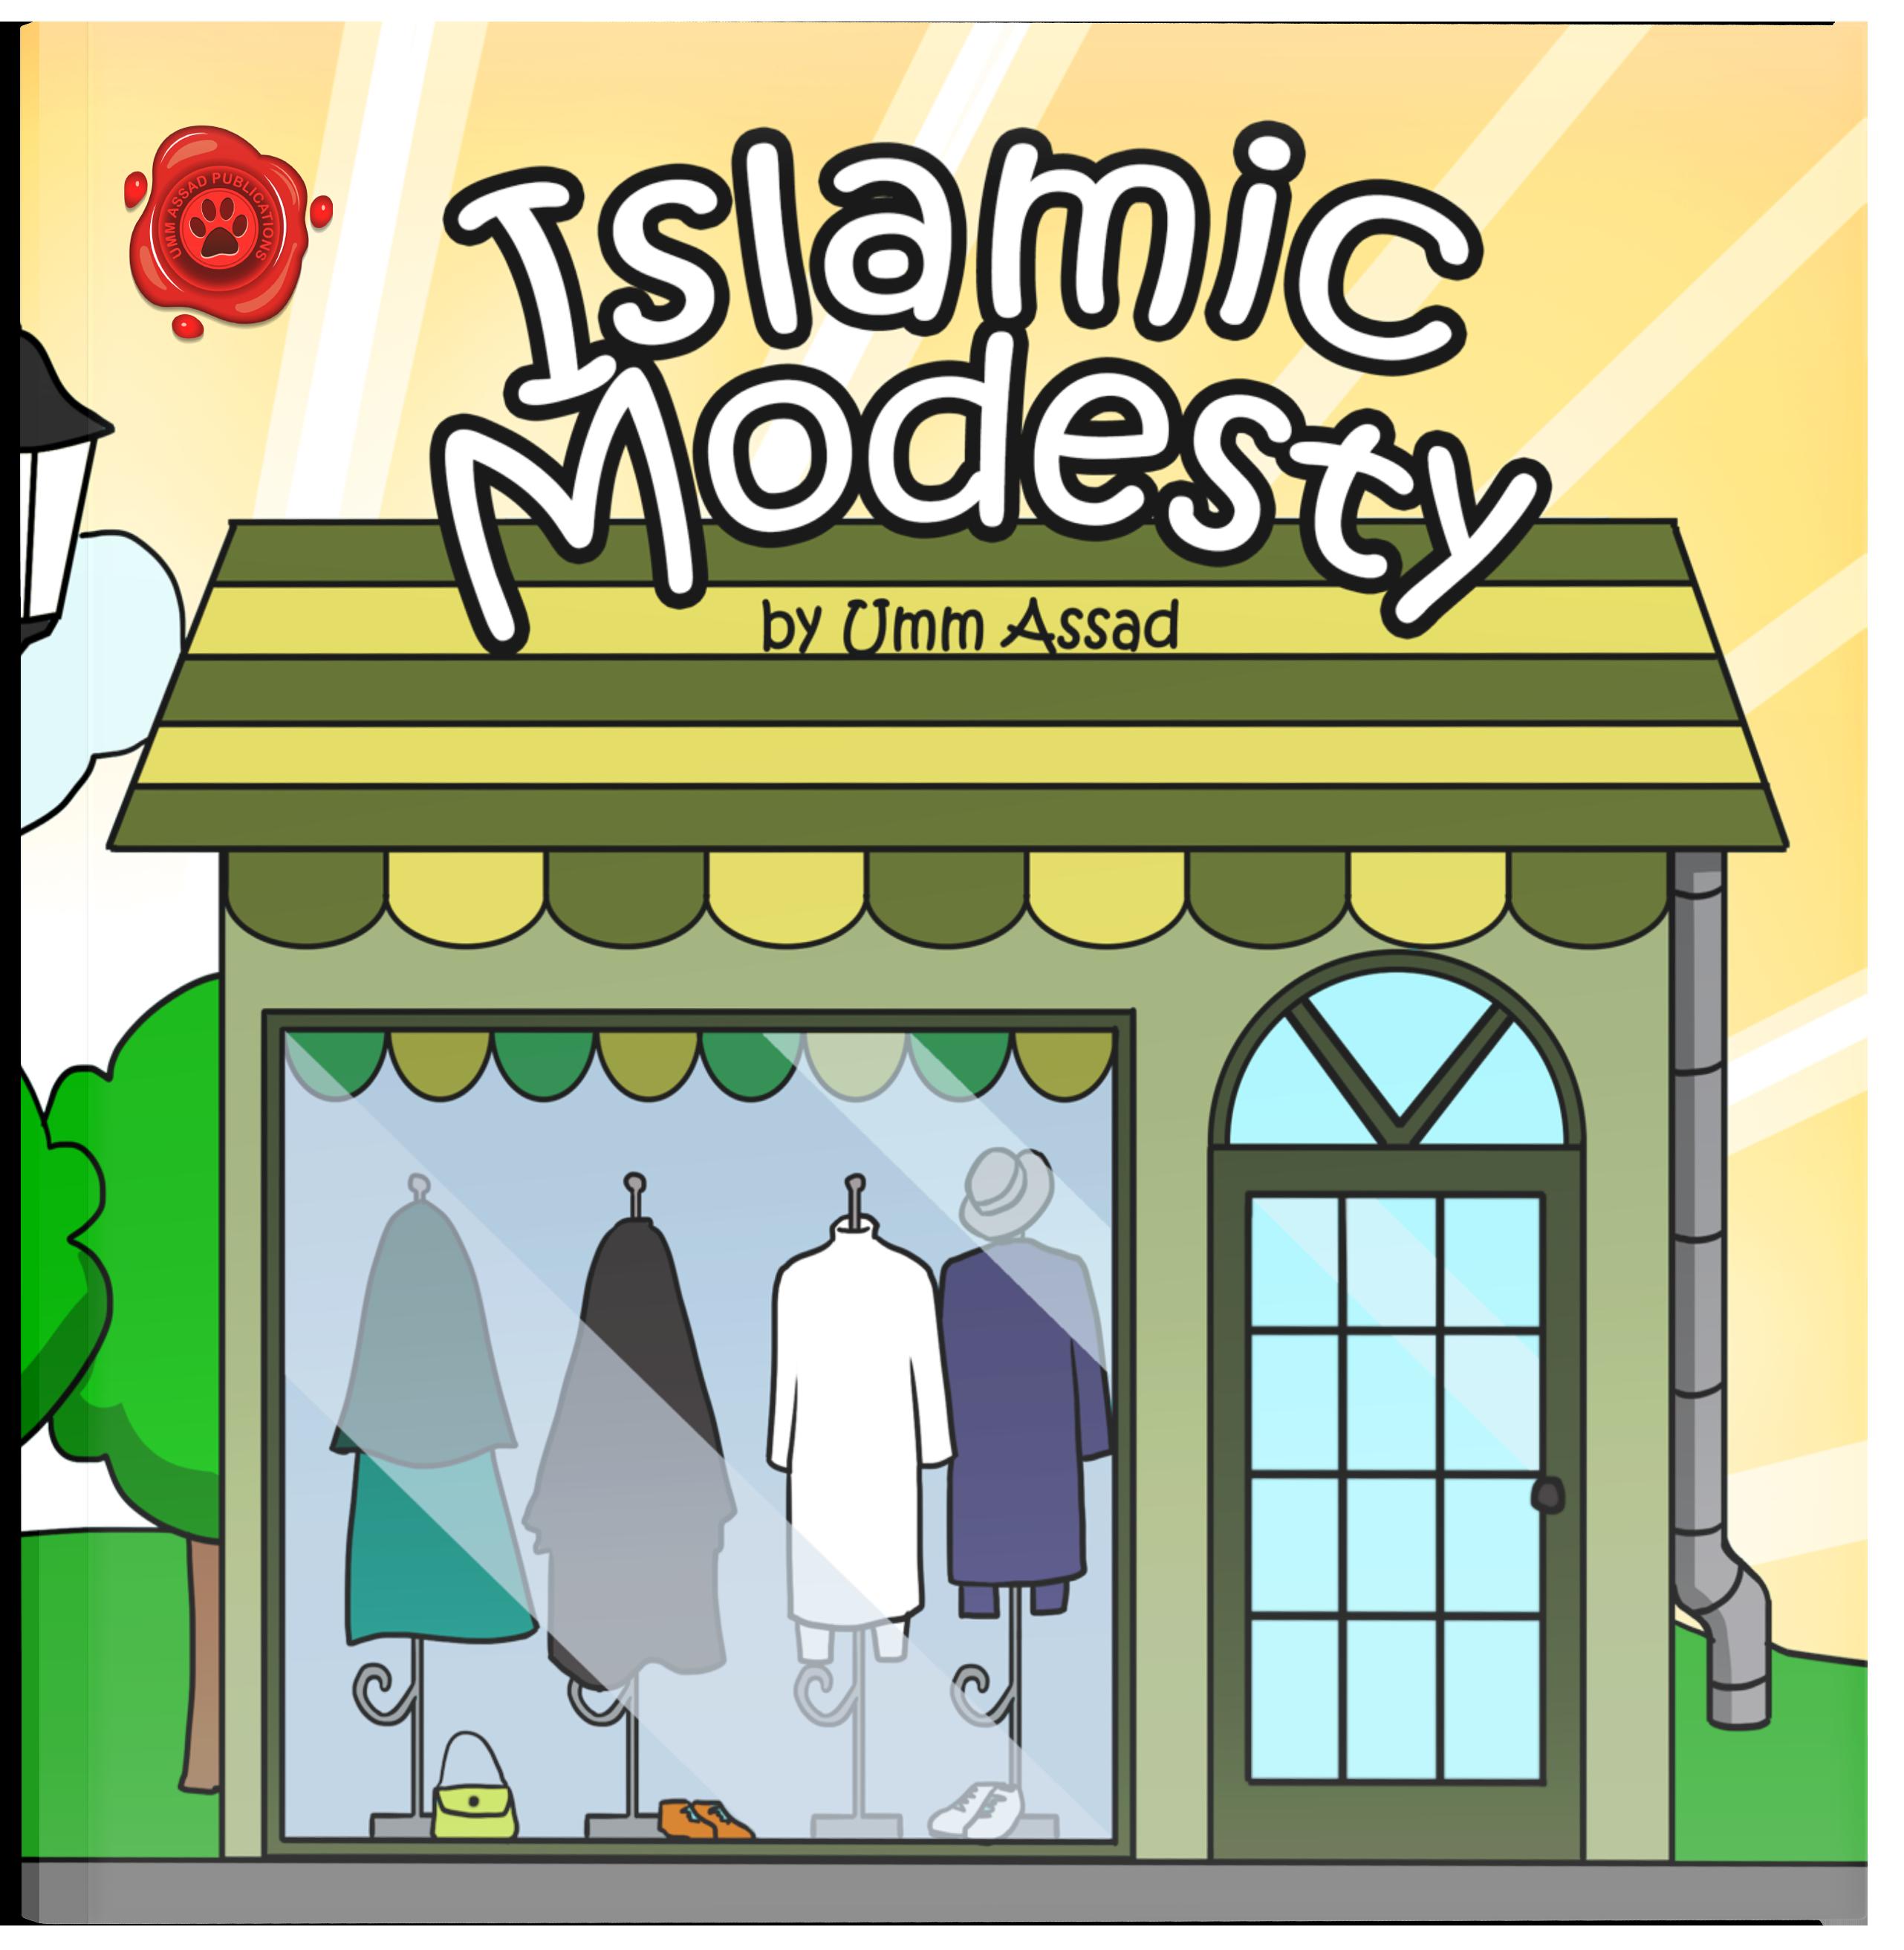 Islamic Modesty